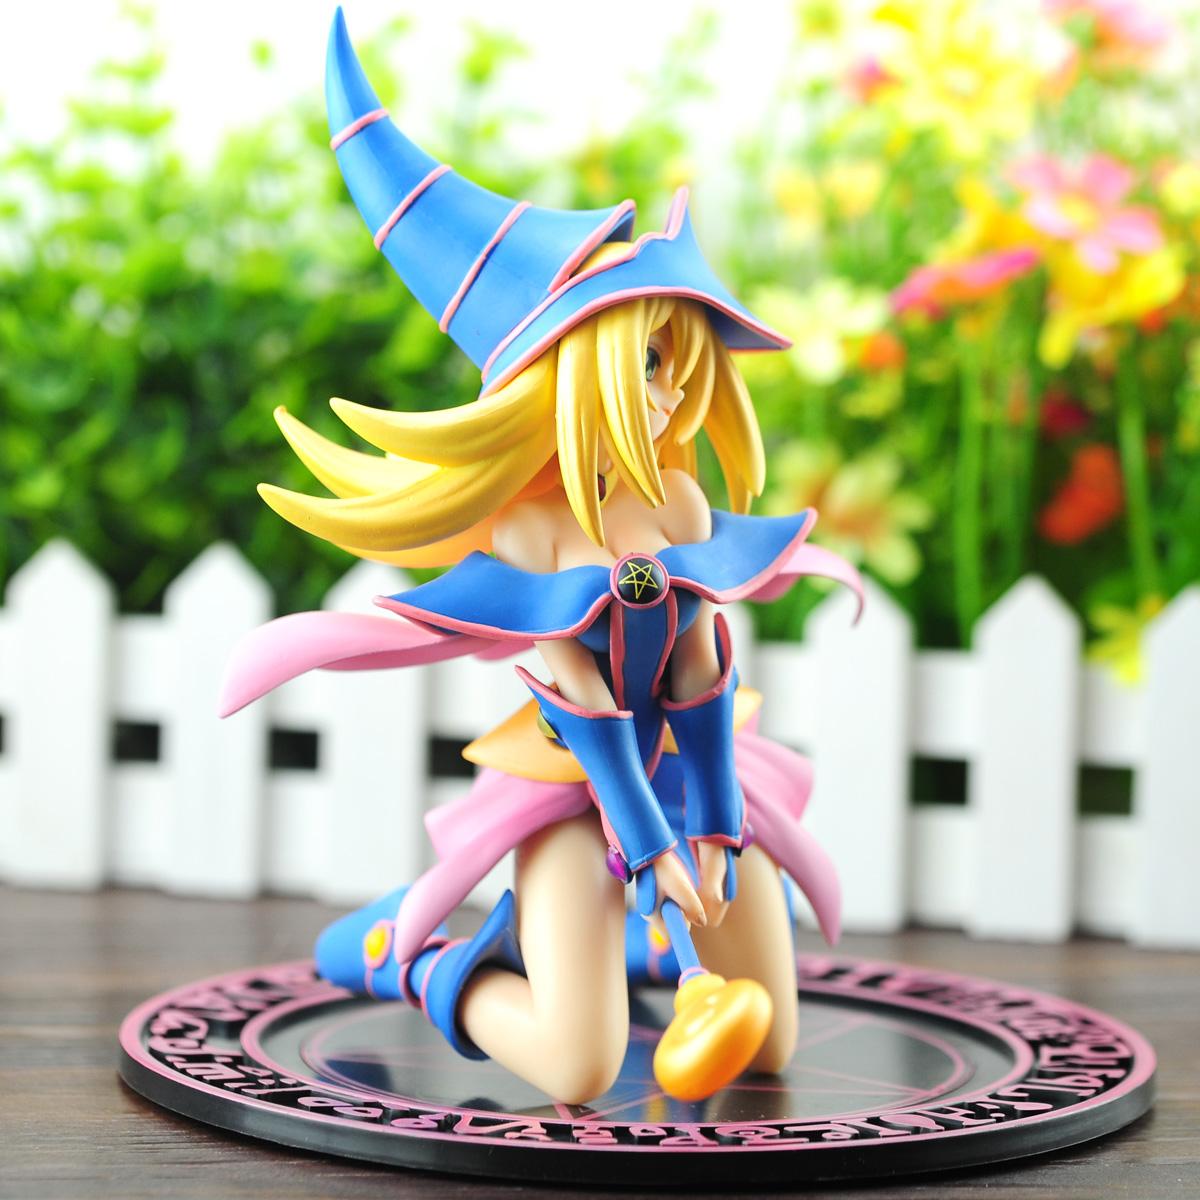 Yu-Gi-Oh! Duel Monsters - Dark Magician Girl (fake)